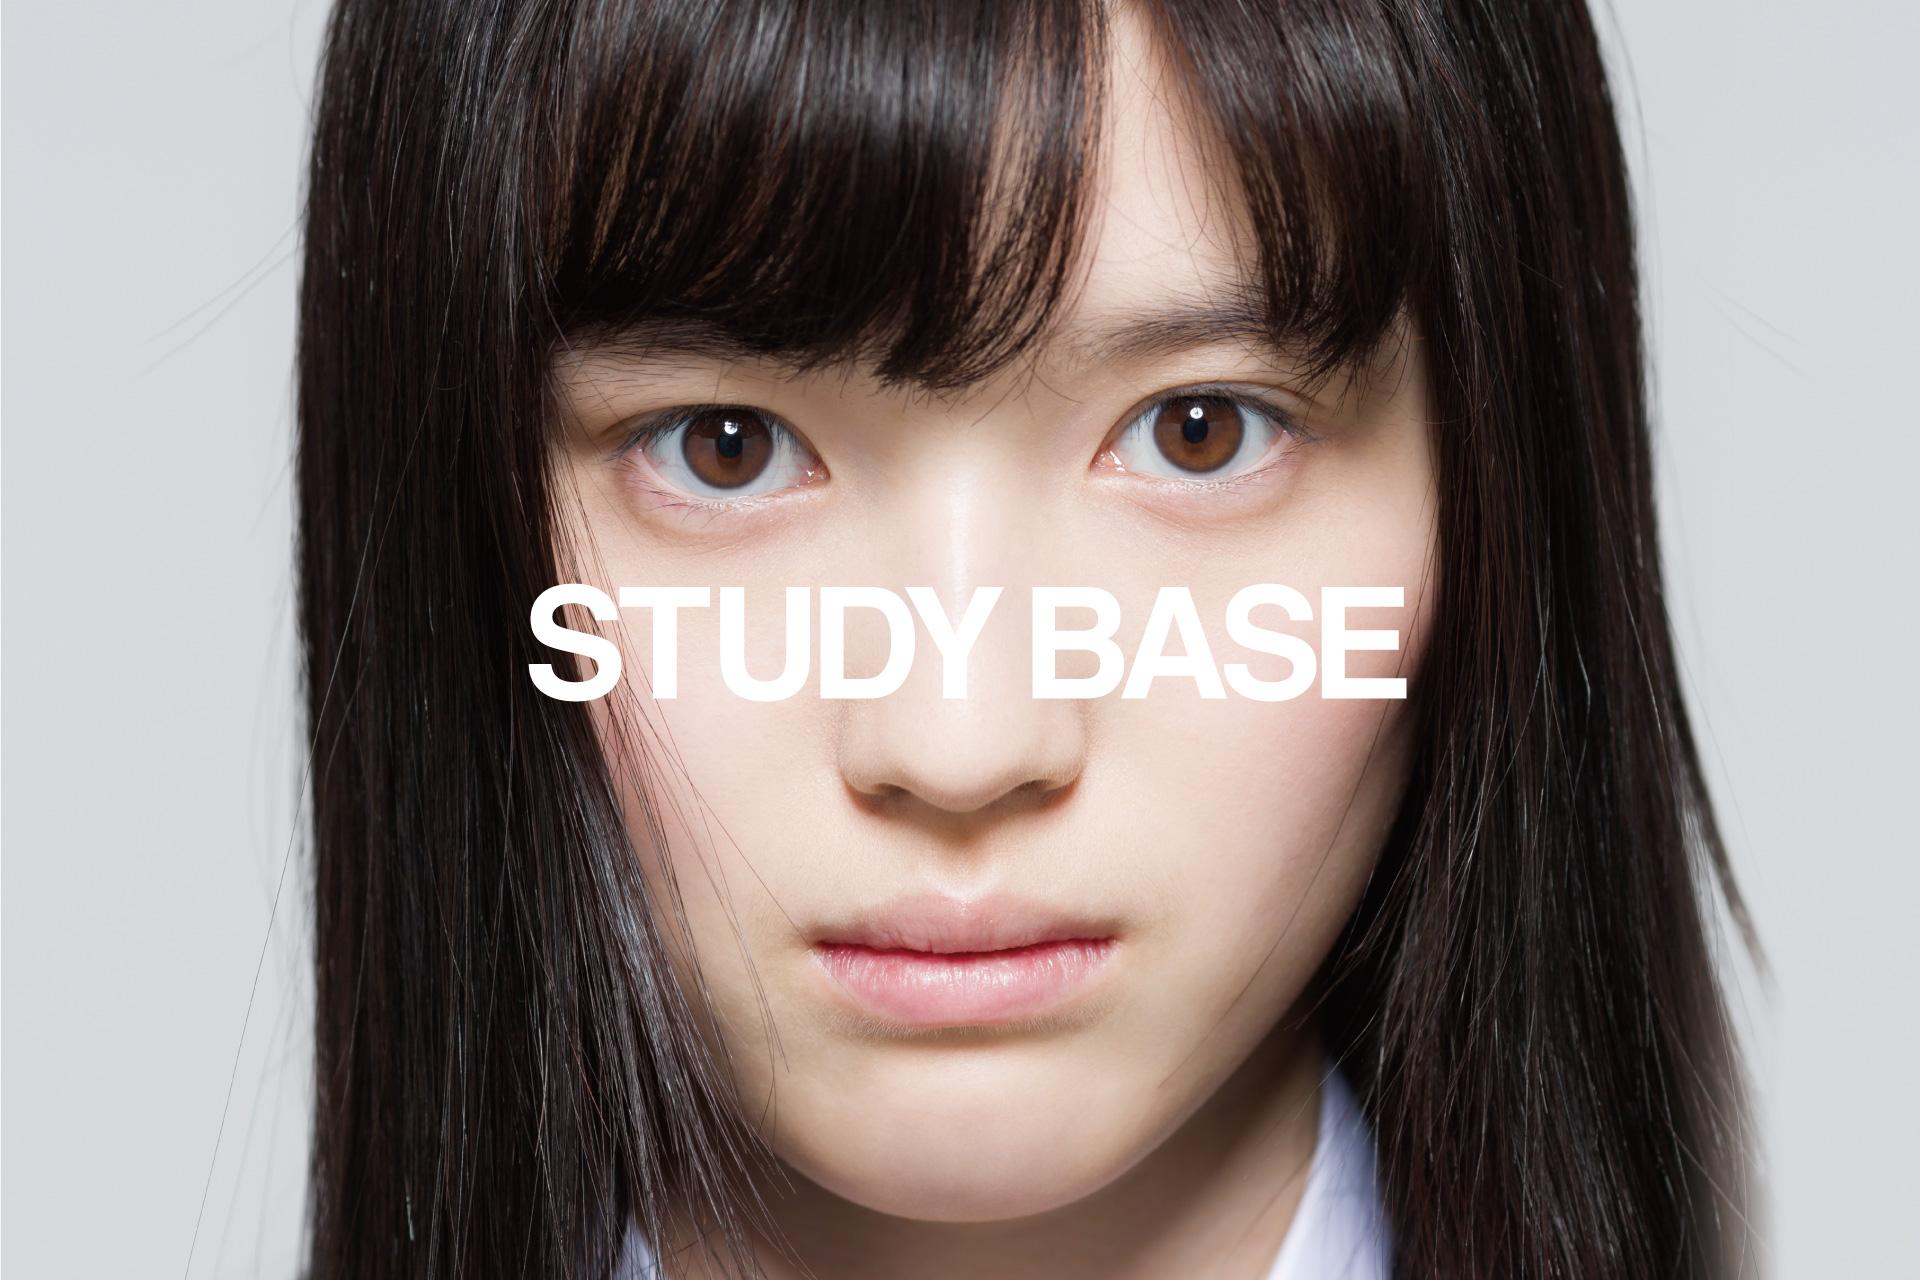 STUDY BASE